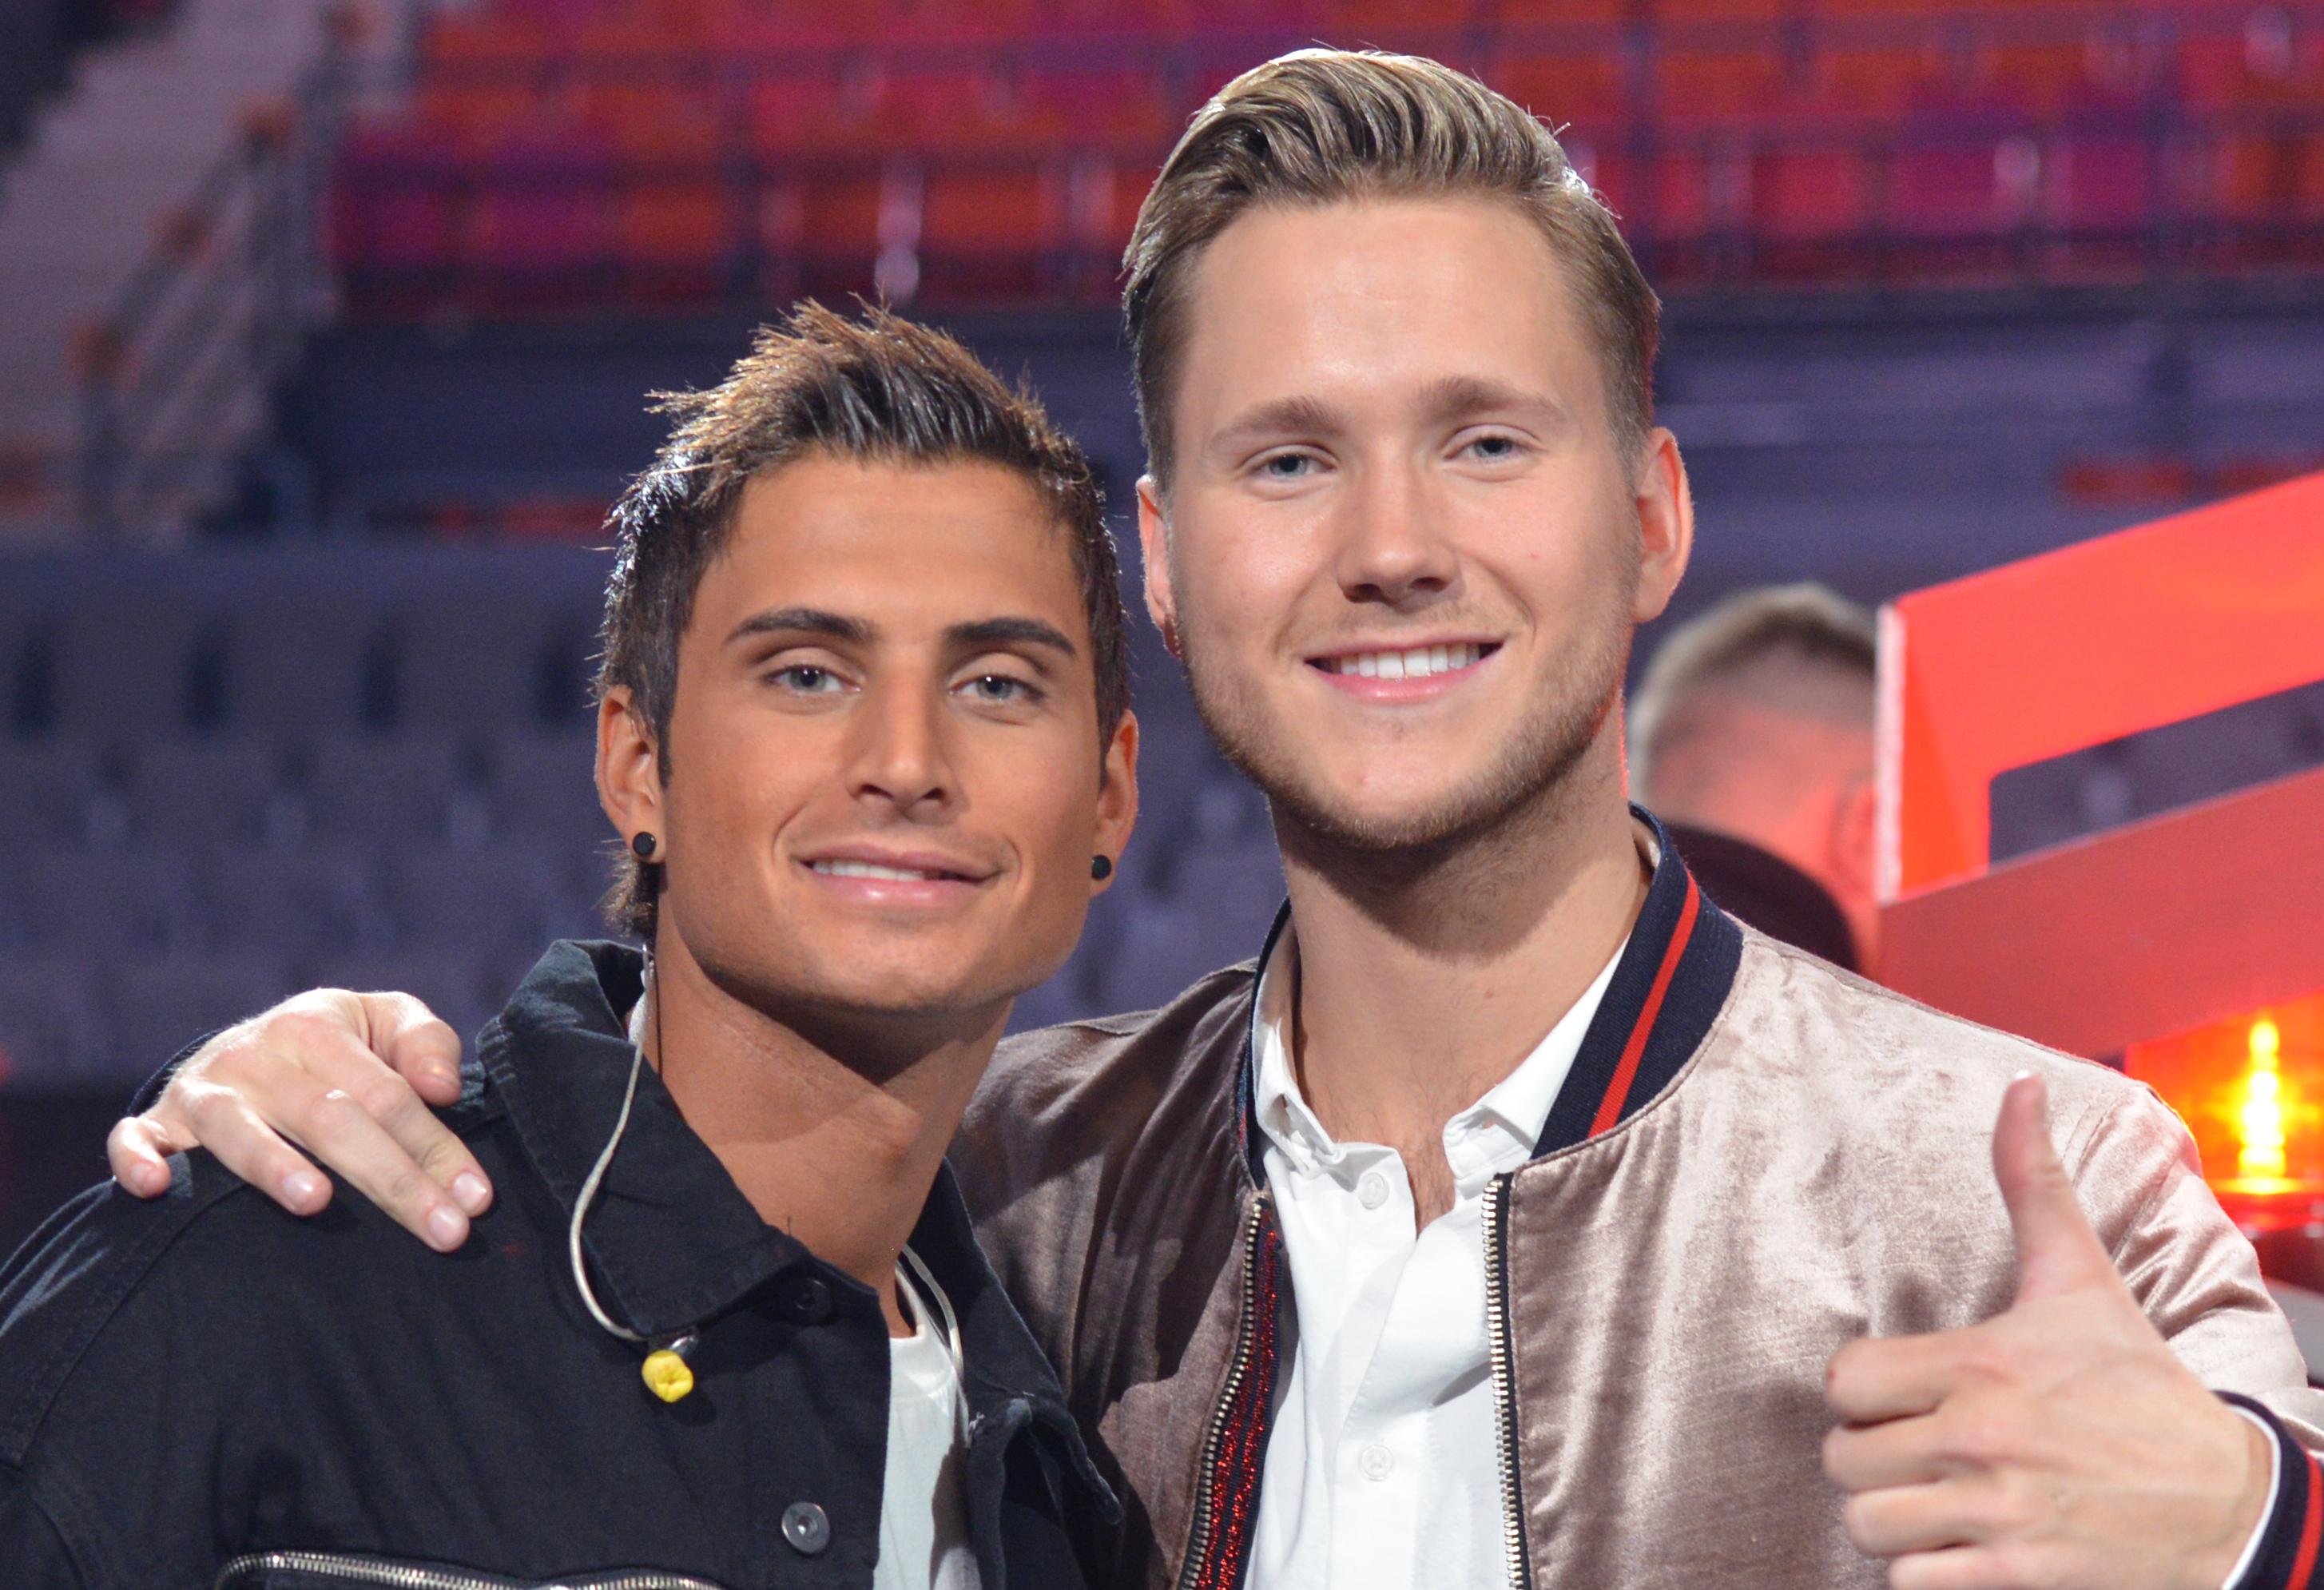 Fil:Melodifestivalen 2018, Samir & Viktor (crop 2).jpg